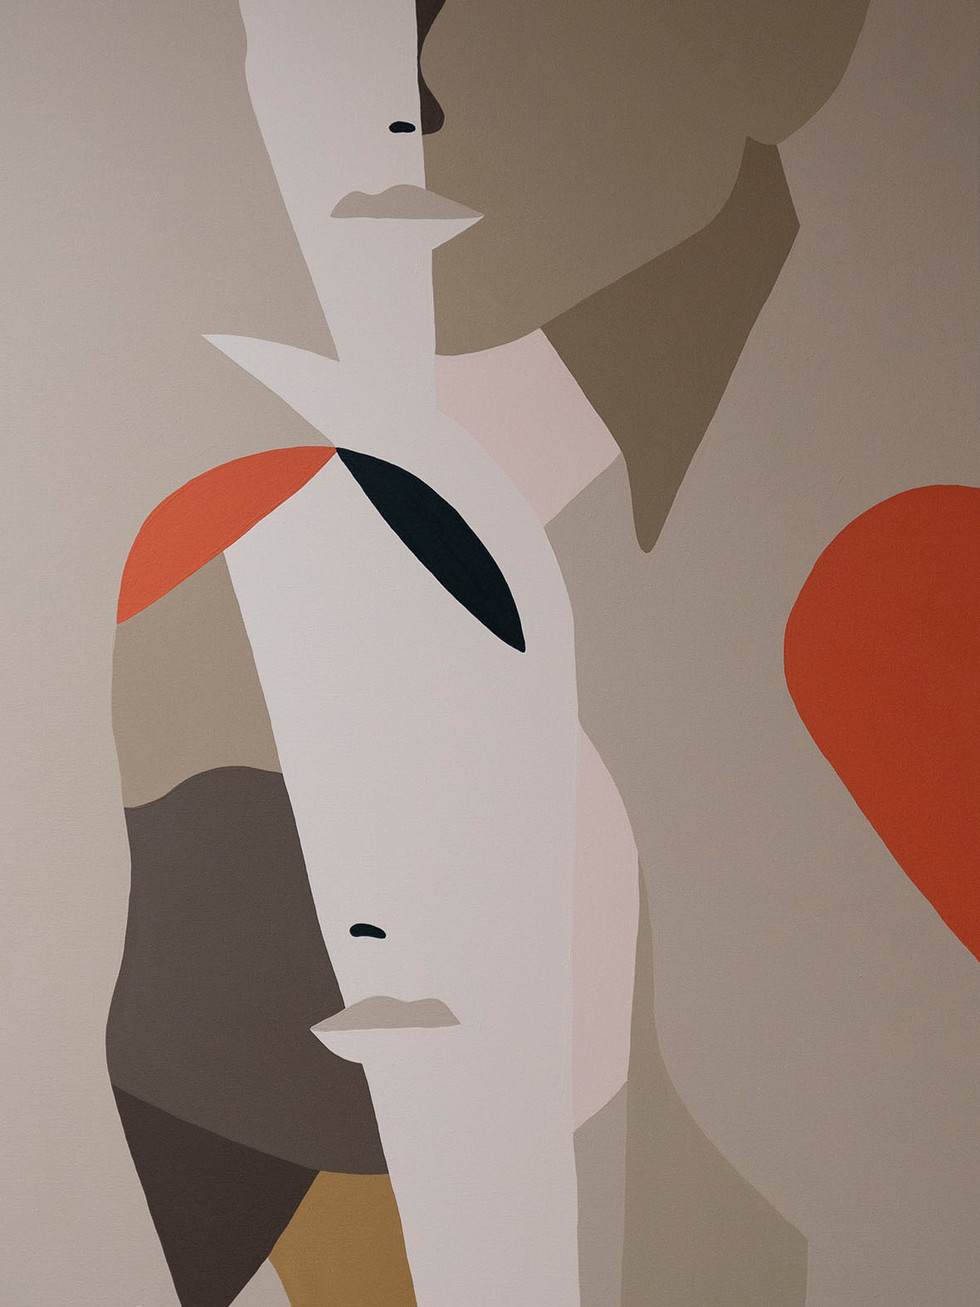 The Daisy Chain, 2021 (commission) acrylic on canvas 60 x 80 cm